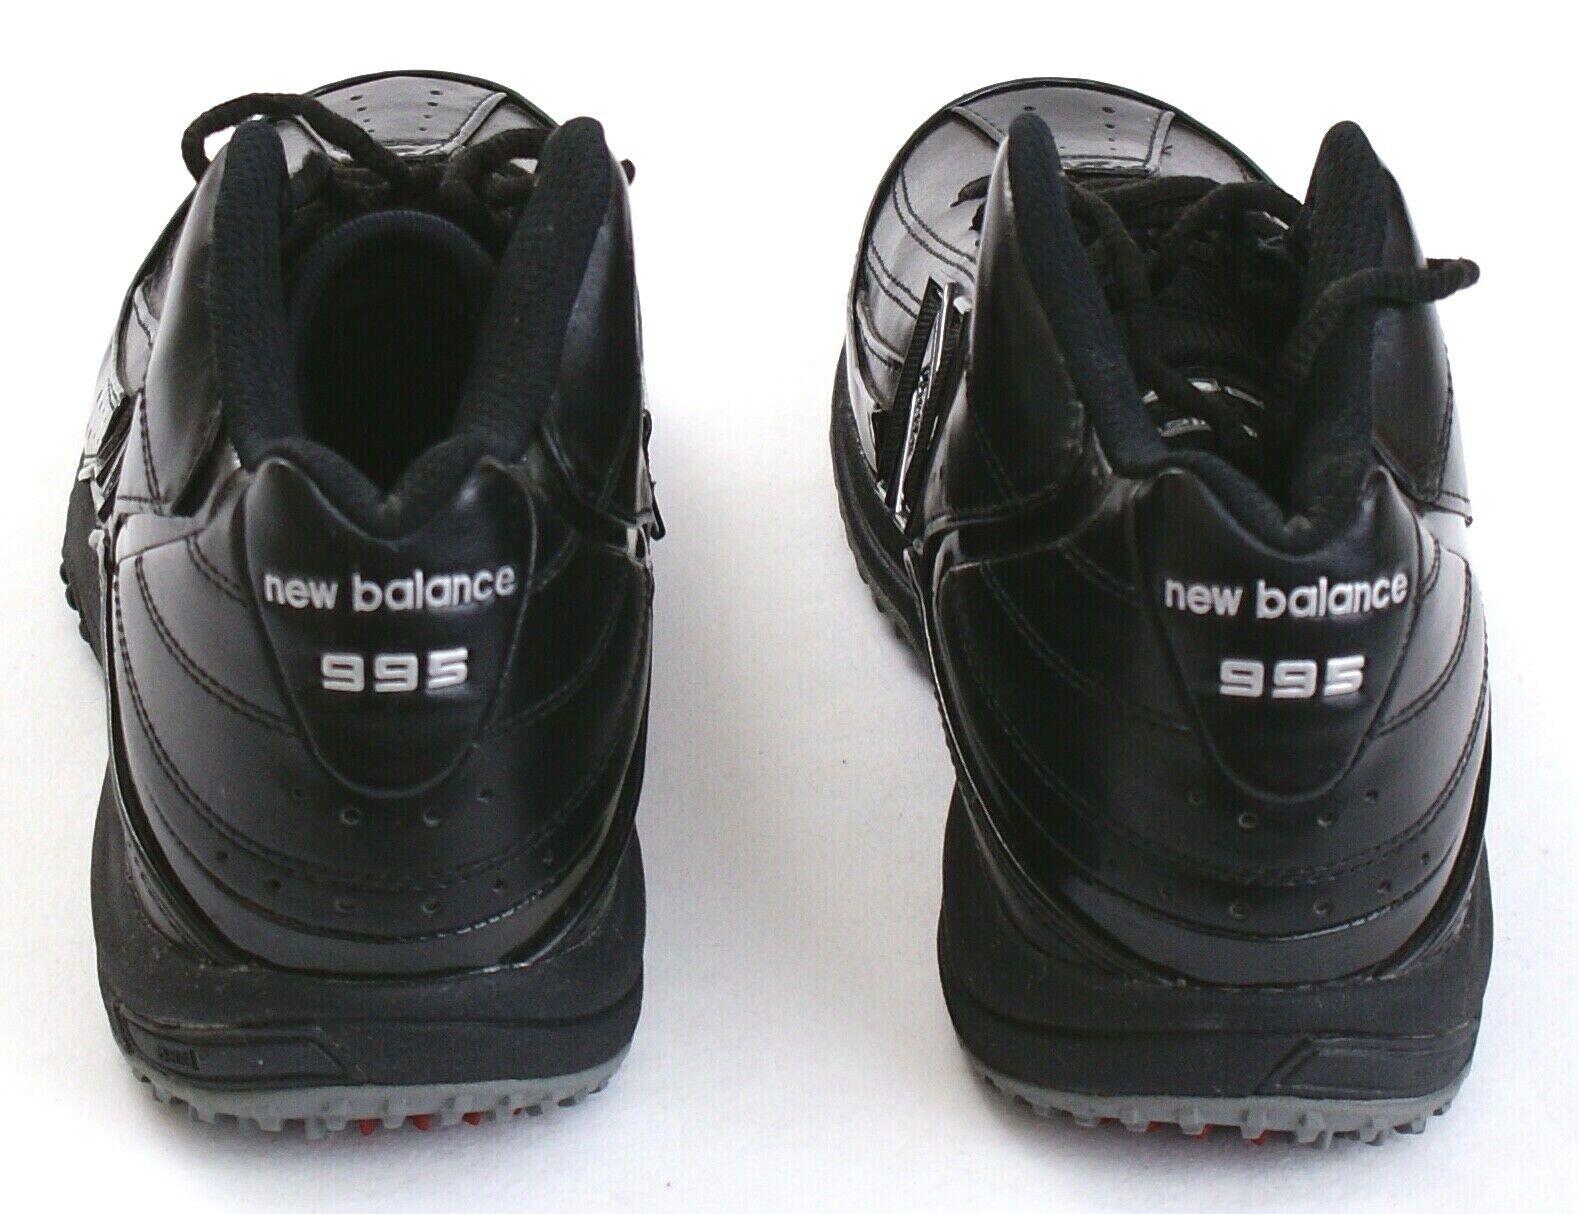 New Balance 995 Team Sports nero Mid Cut Football Football Football Turf scarpe Uomo NEW 8f35df